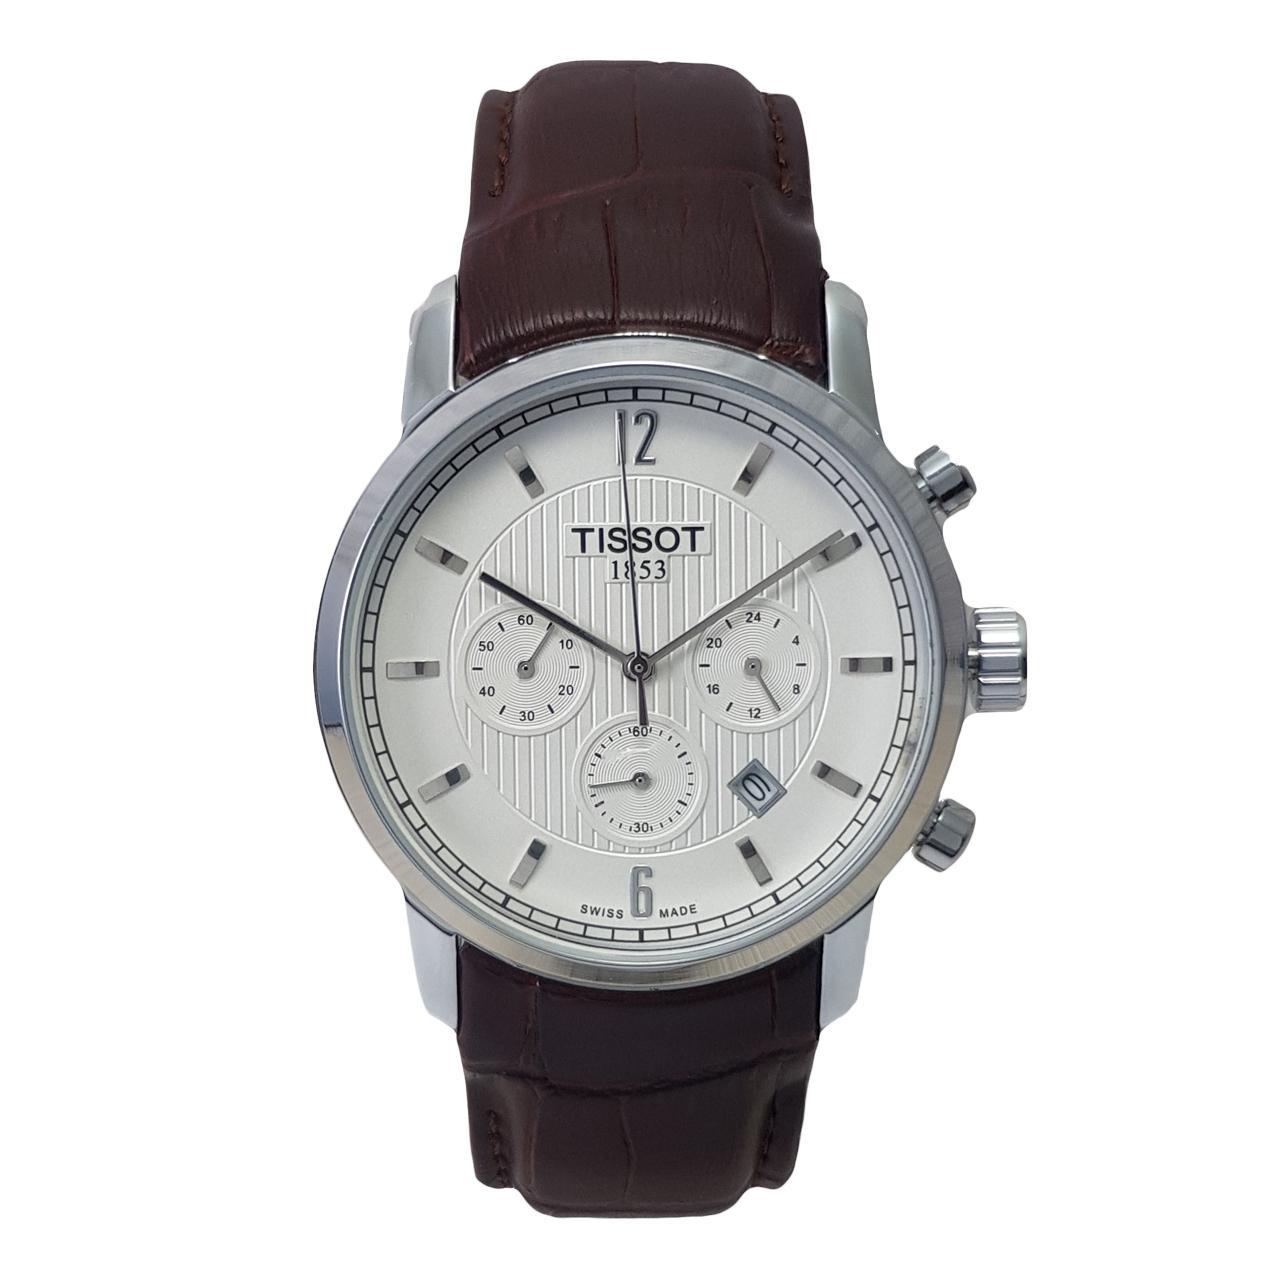 ساعت مچی عقربه ای مردانه مدل TS-1853N